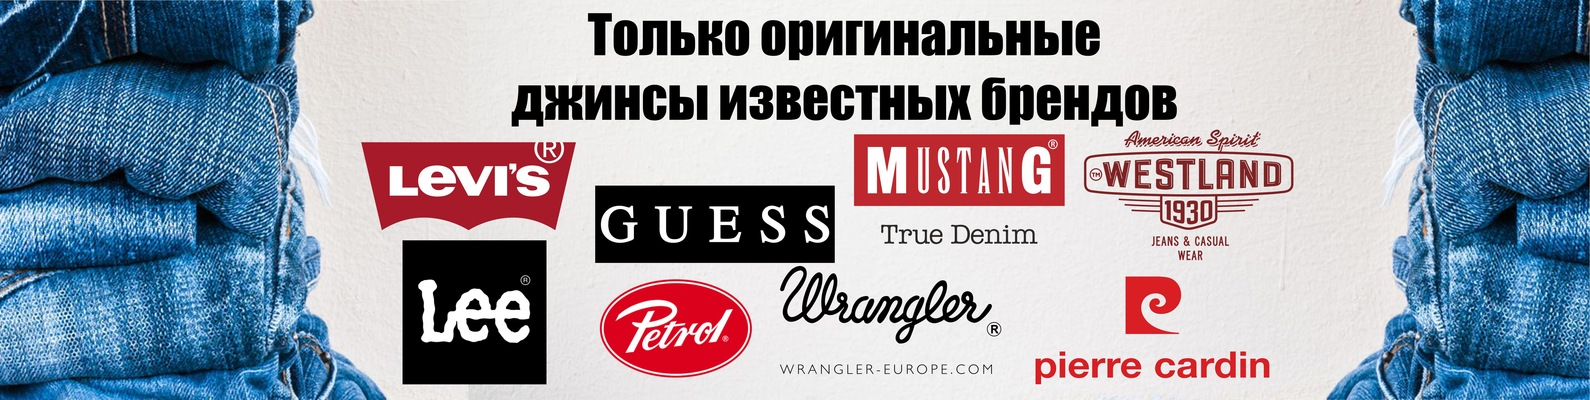 9767f8f41130 Мега Джинс | ВКонтакте